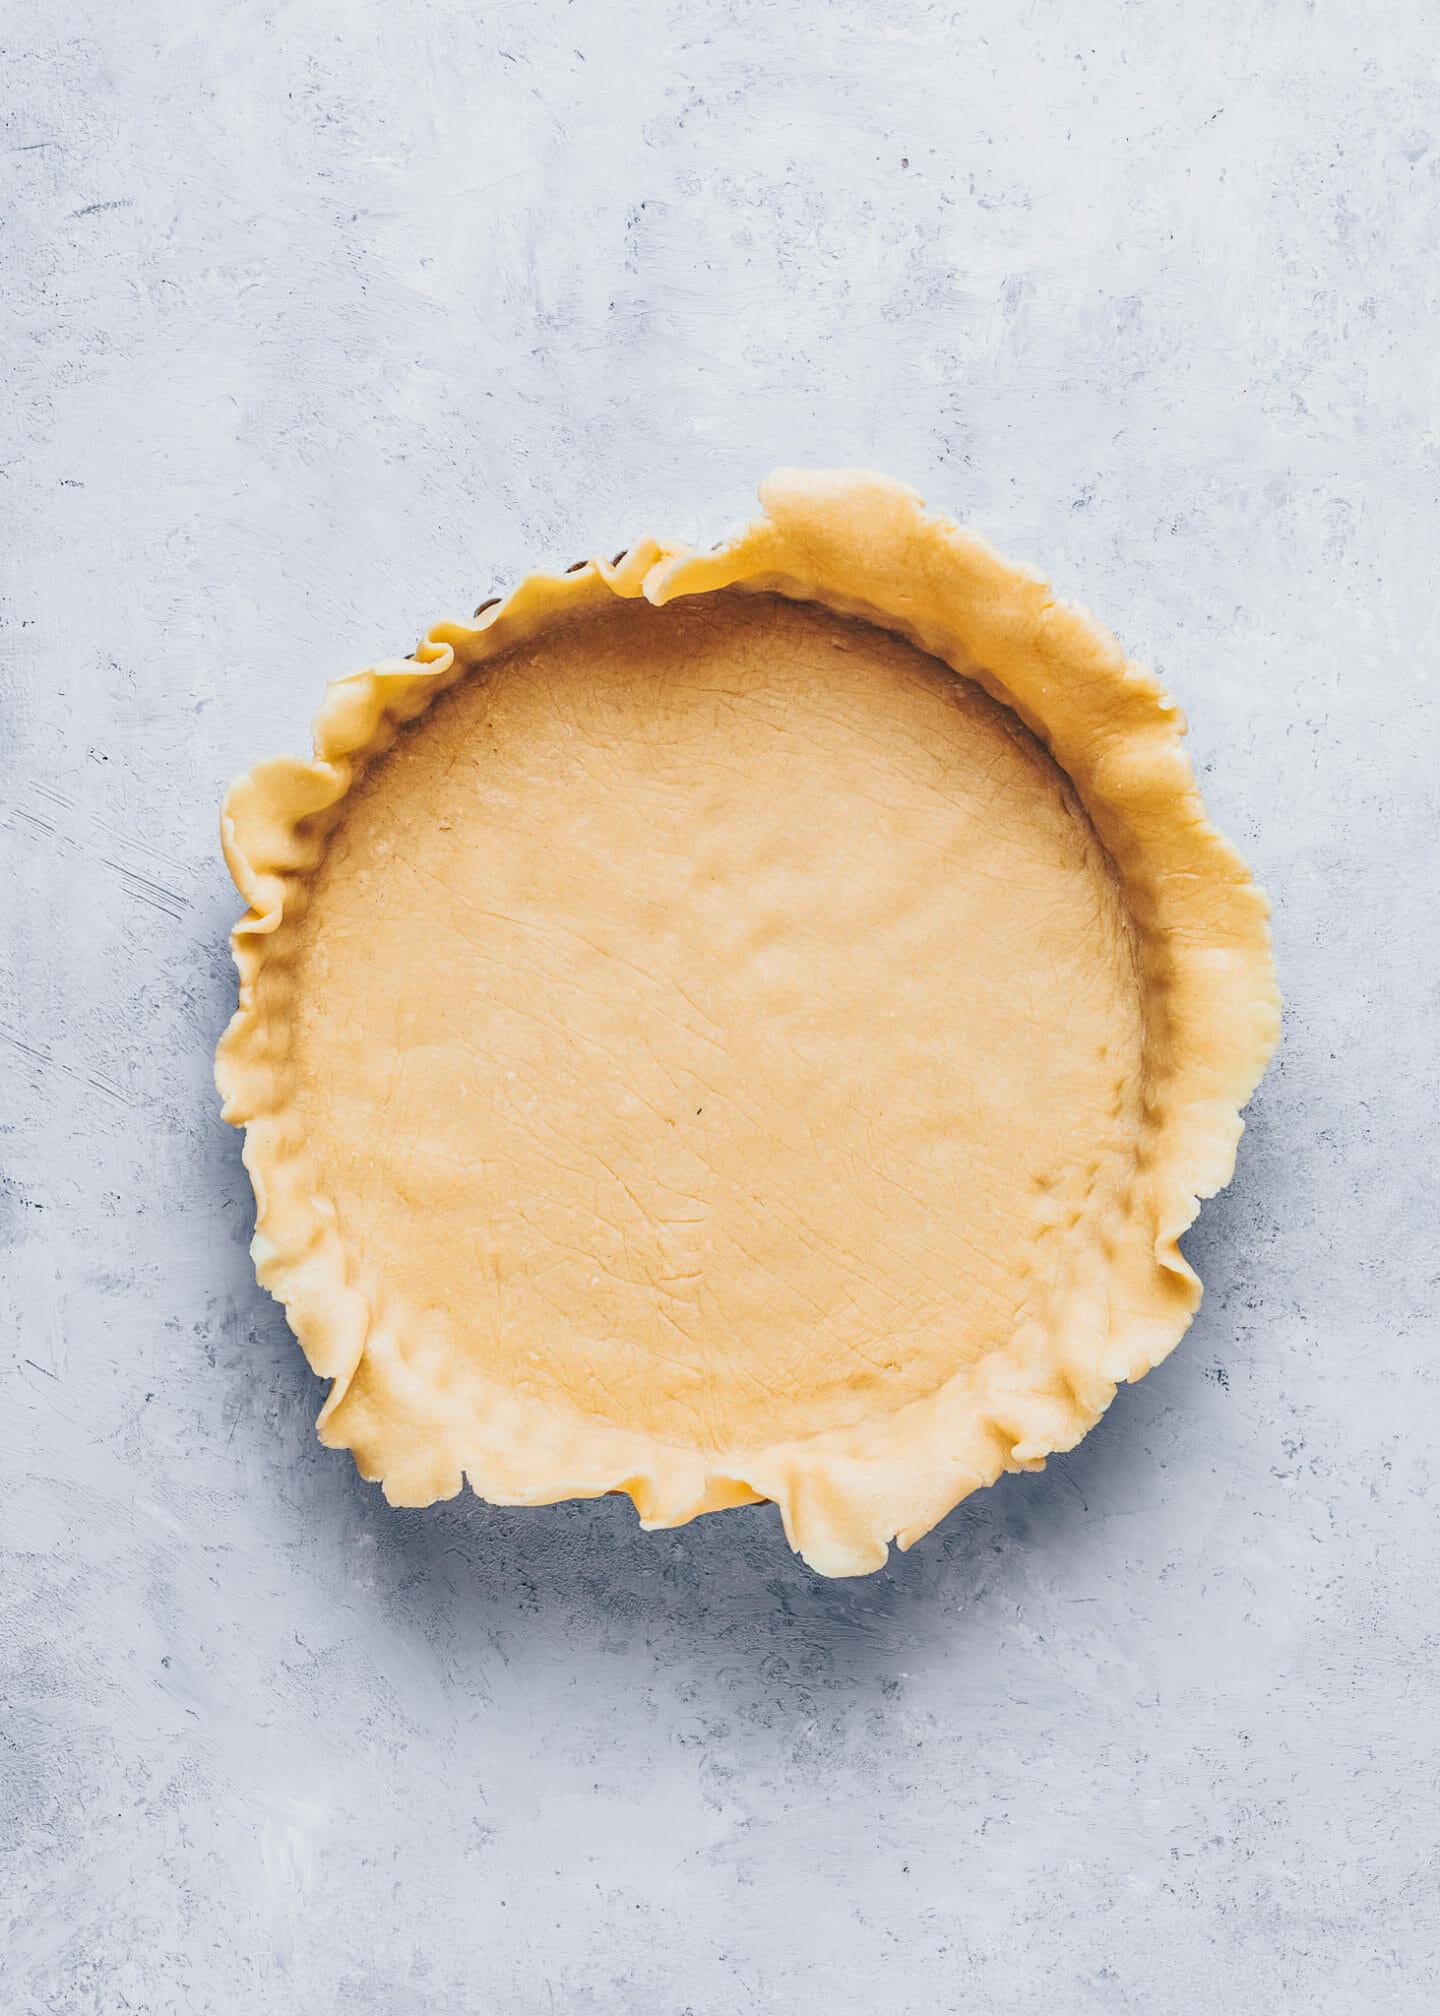 Tart Crust (homemade shortcrust pastry)